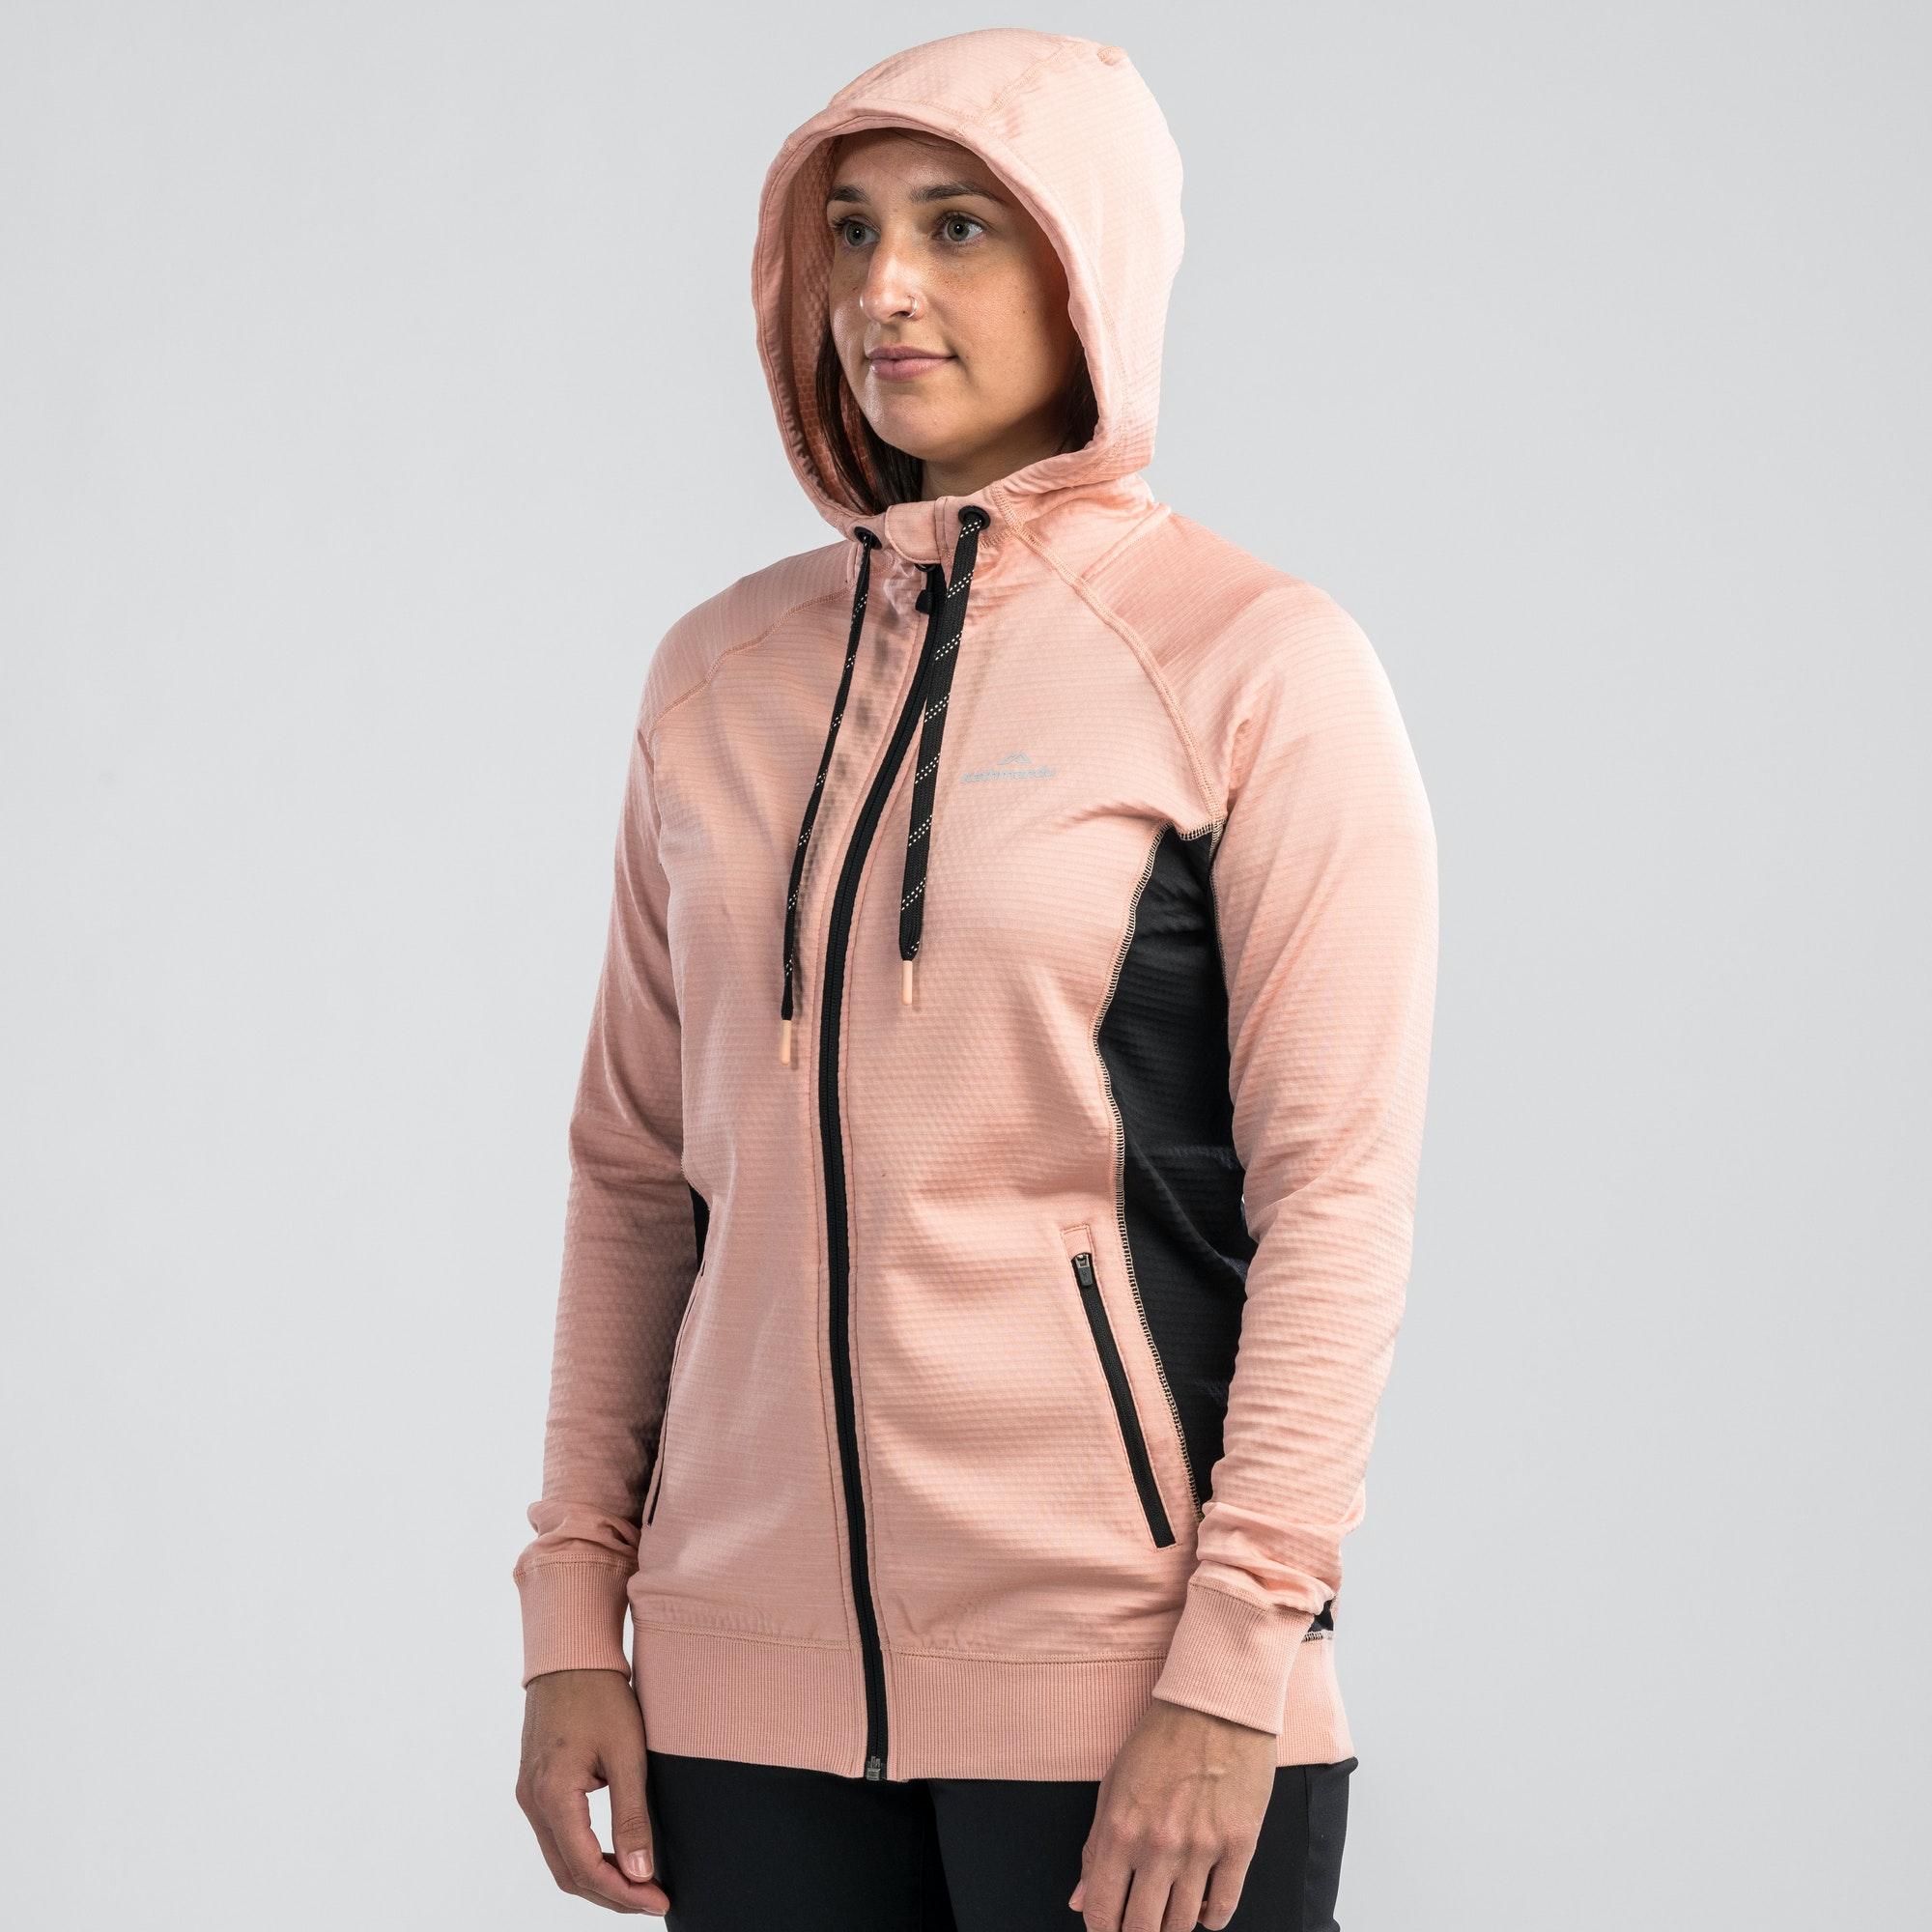 NEW-Kathmandu-Acota-Women-s-Hooded-Fleece-Lightweight-Breathable-Outdoor-Jacket thumbnail 35